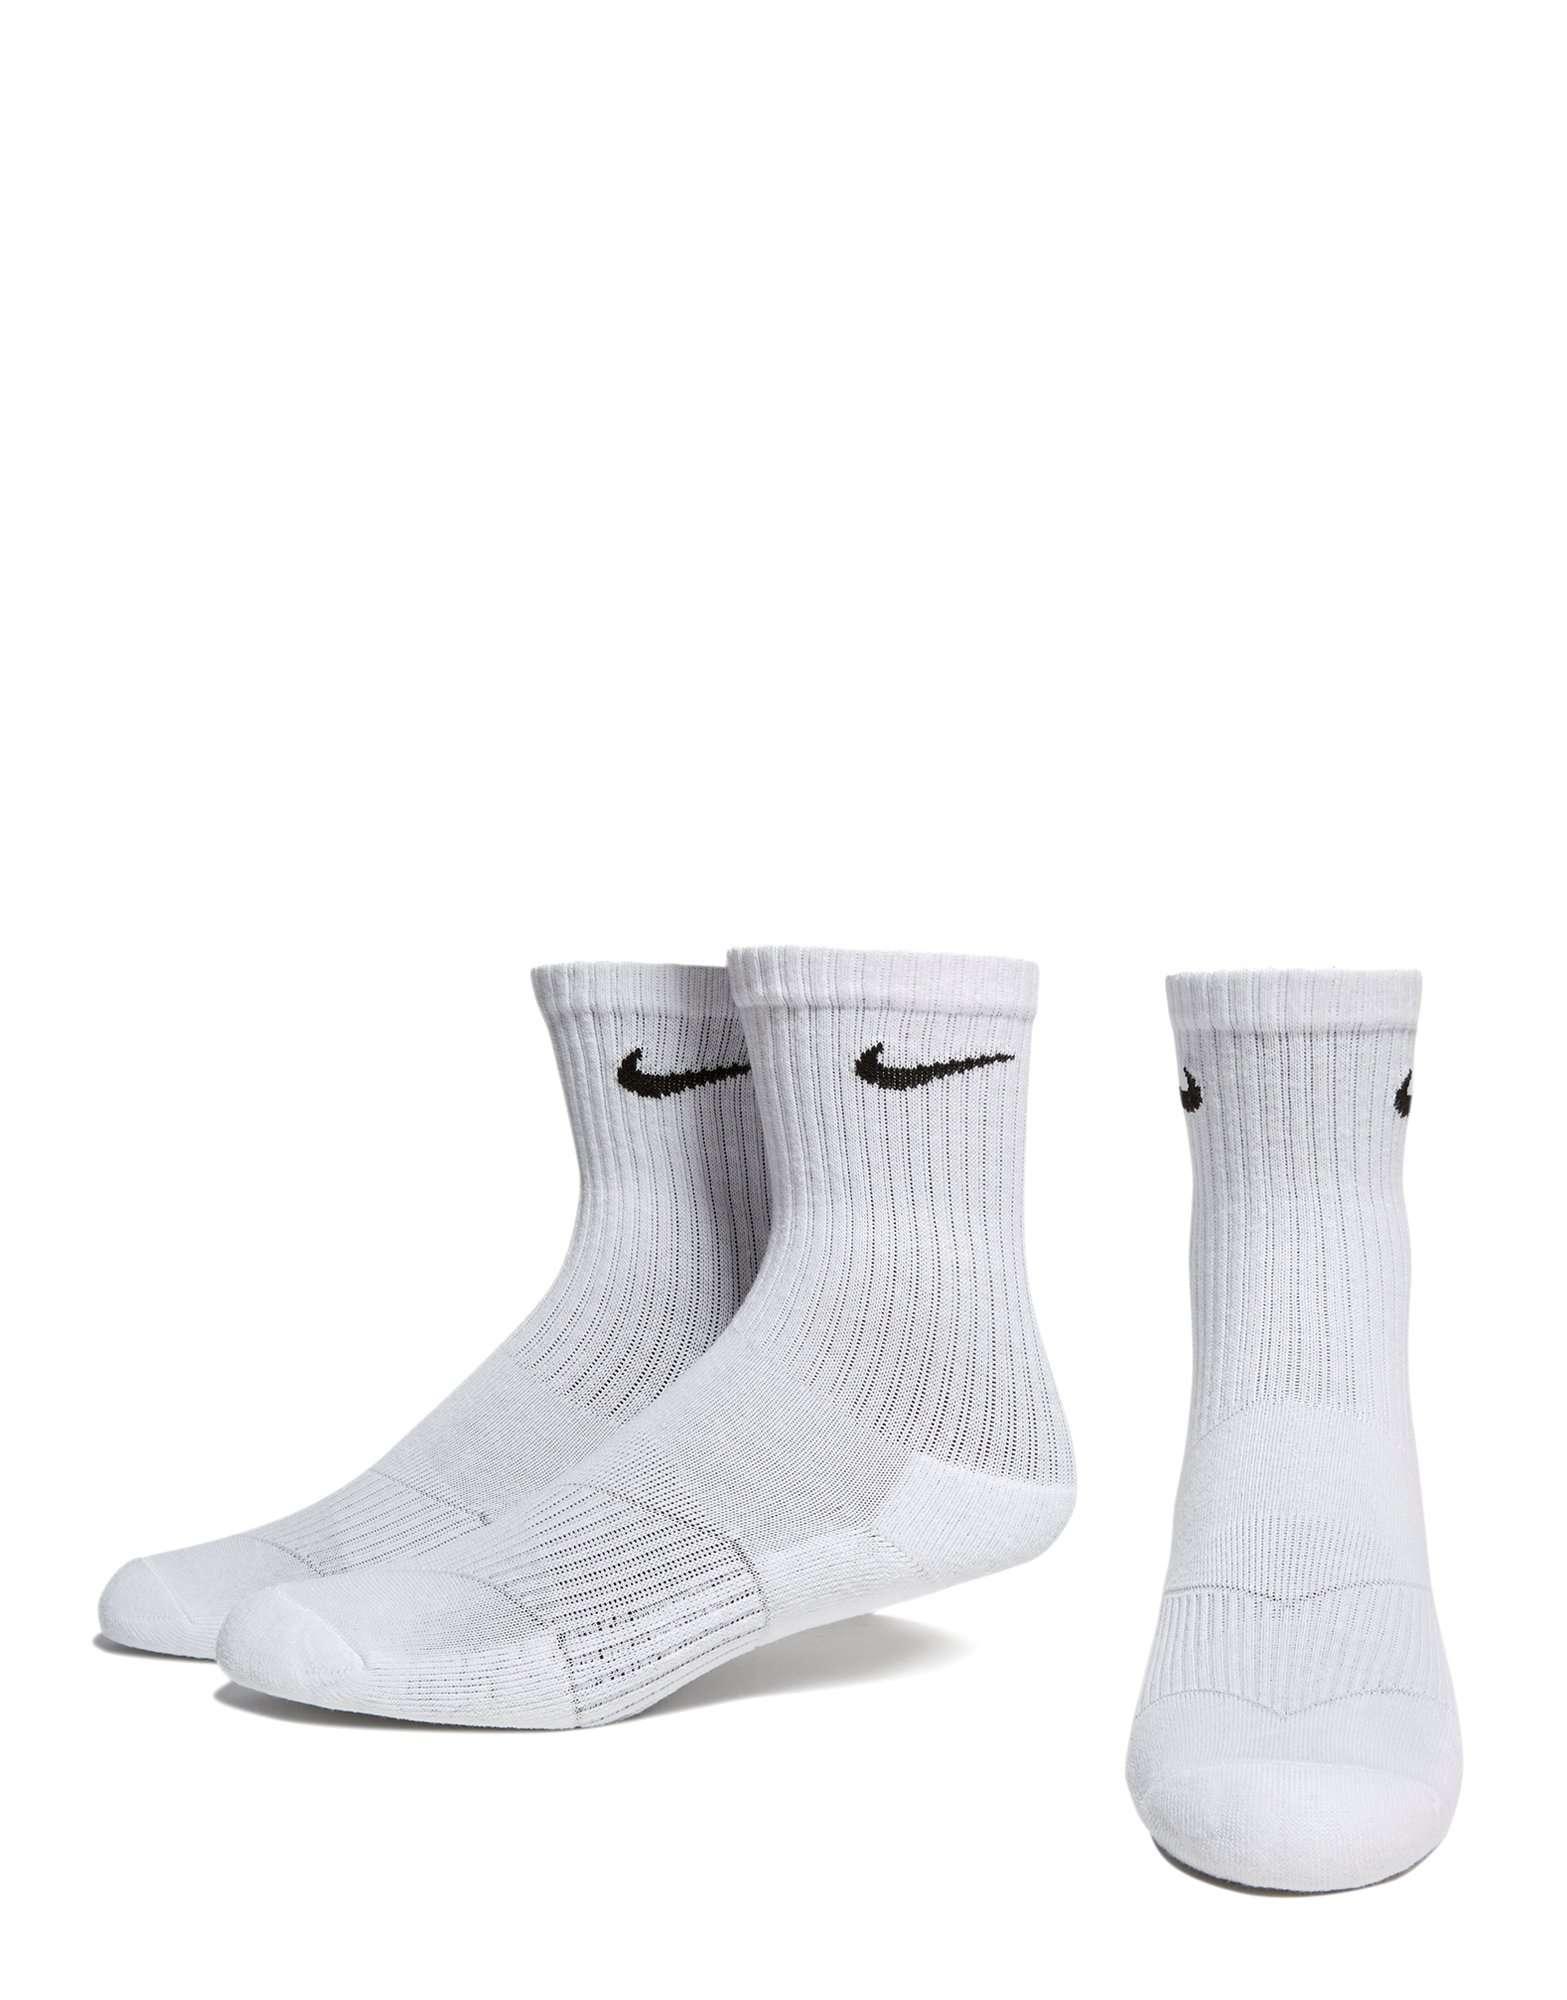 Nike Pack de 3 calcetines para niños